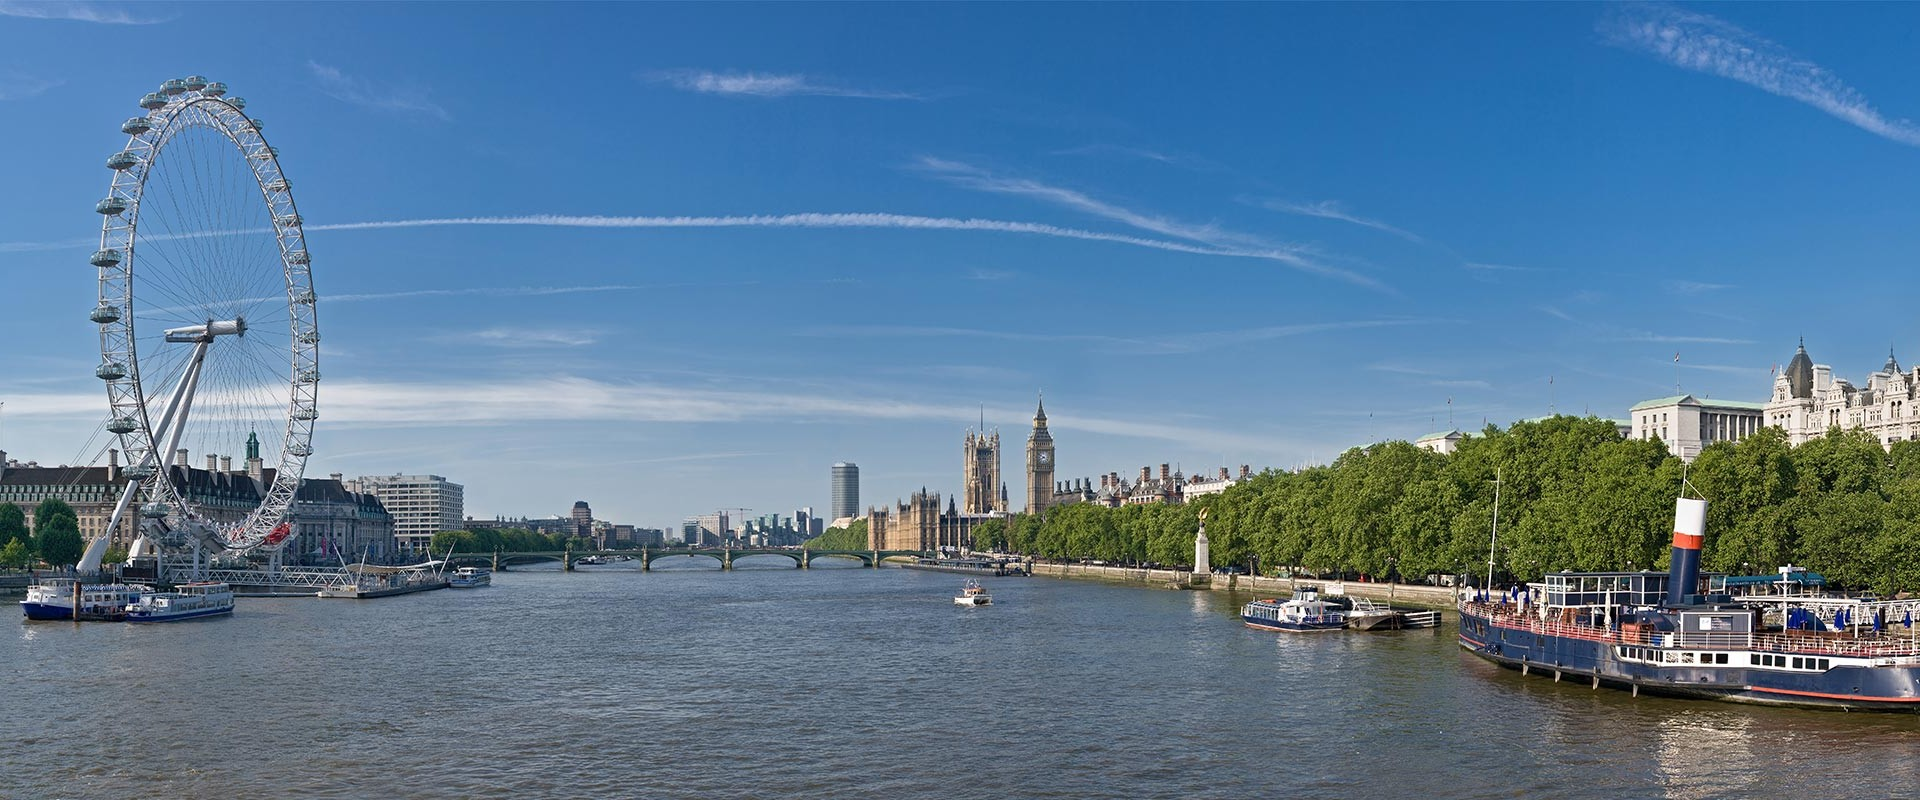 Sport a Londra lavoro a Londra